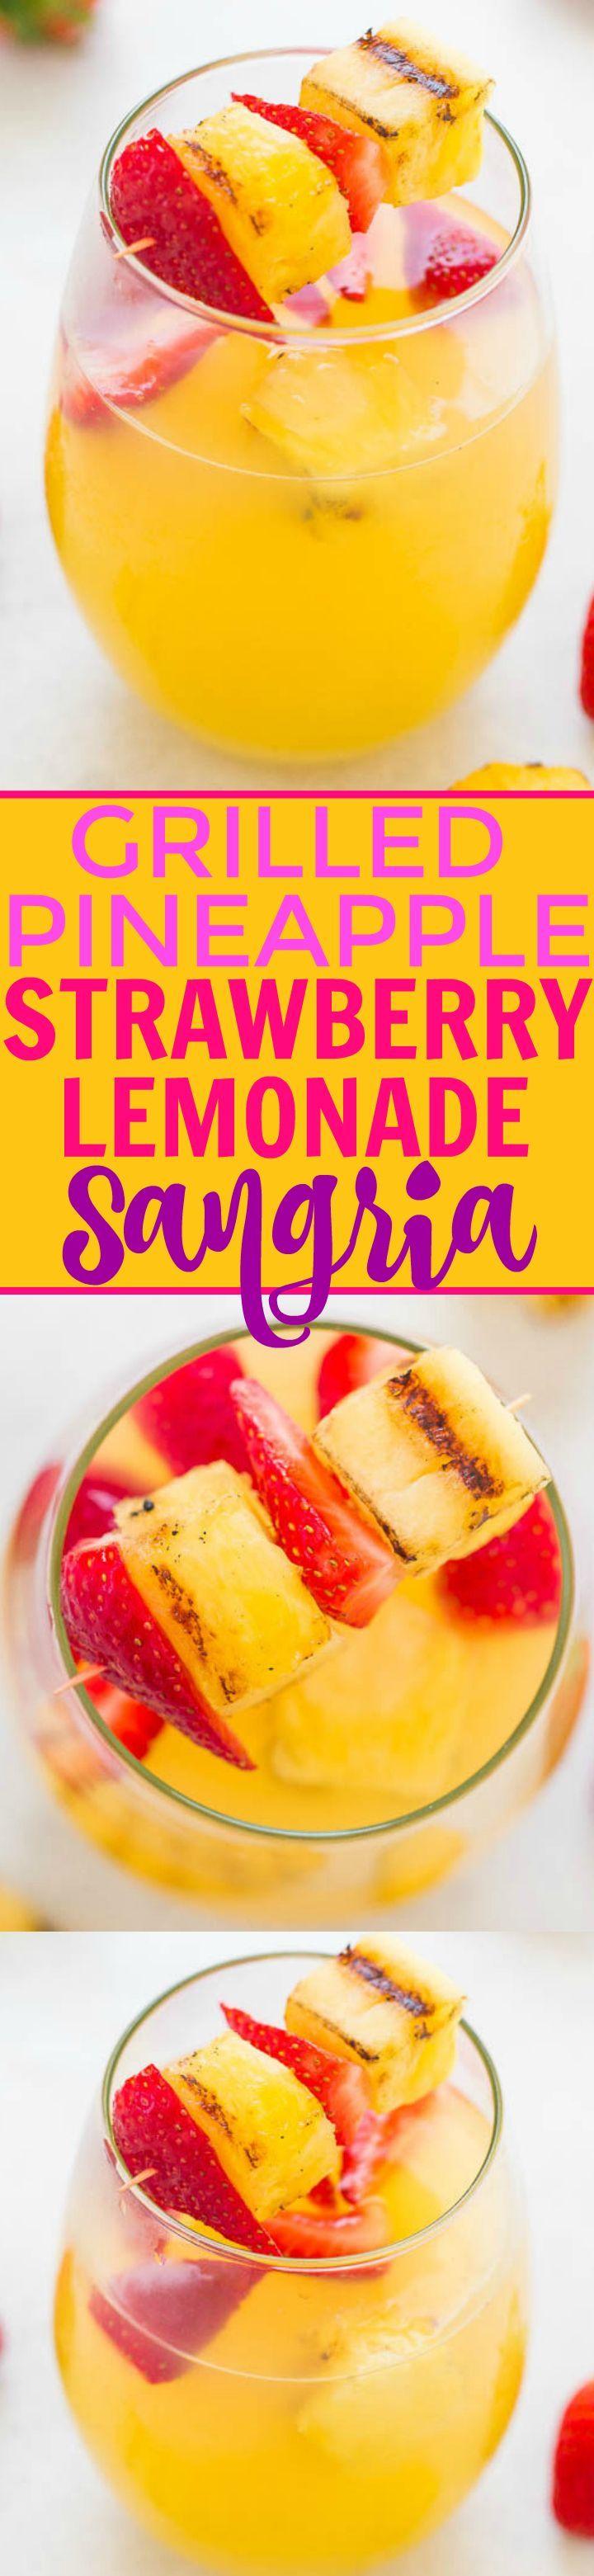 Grilled Pineapple Strawberry Lemonade Sangria